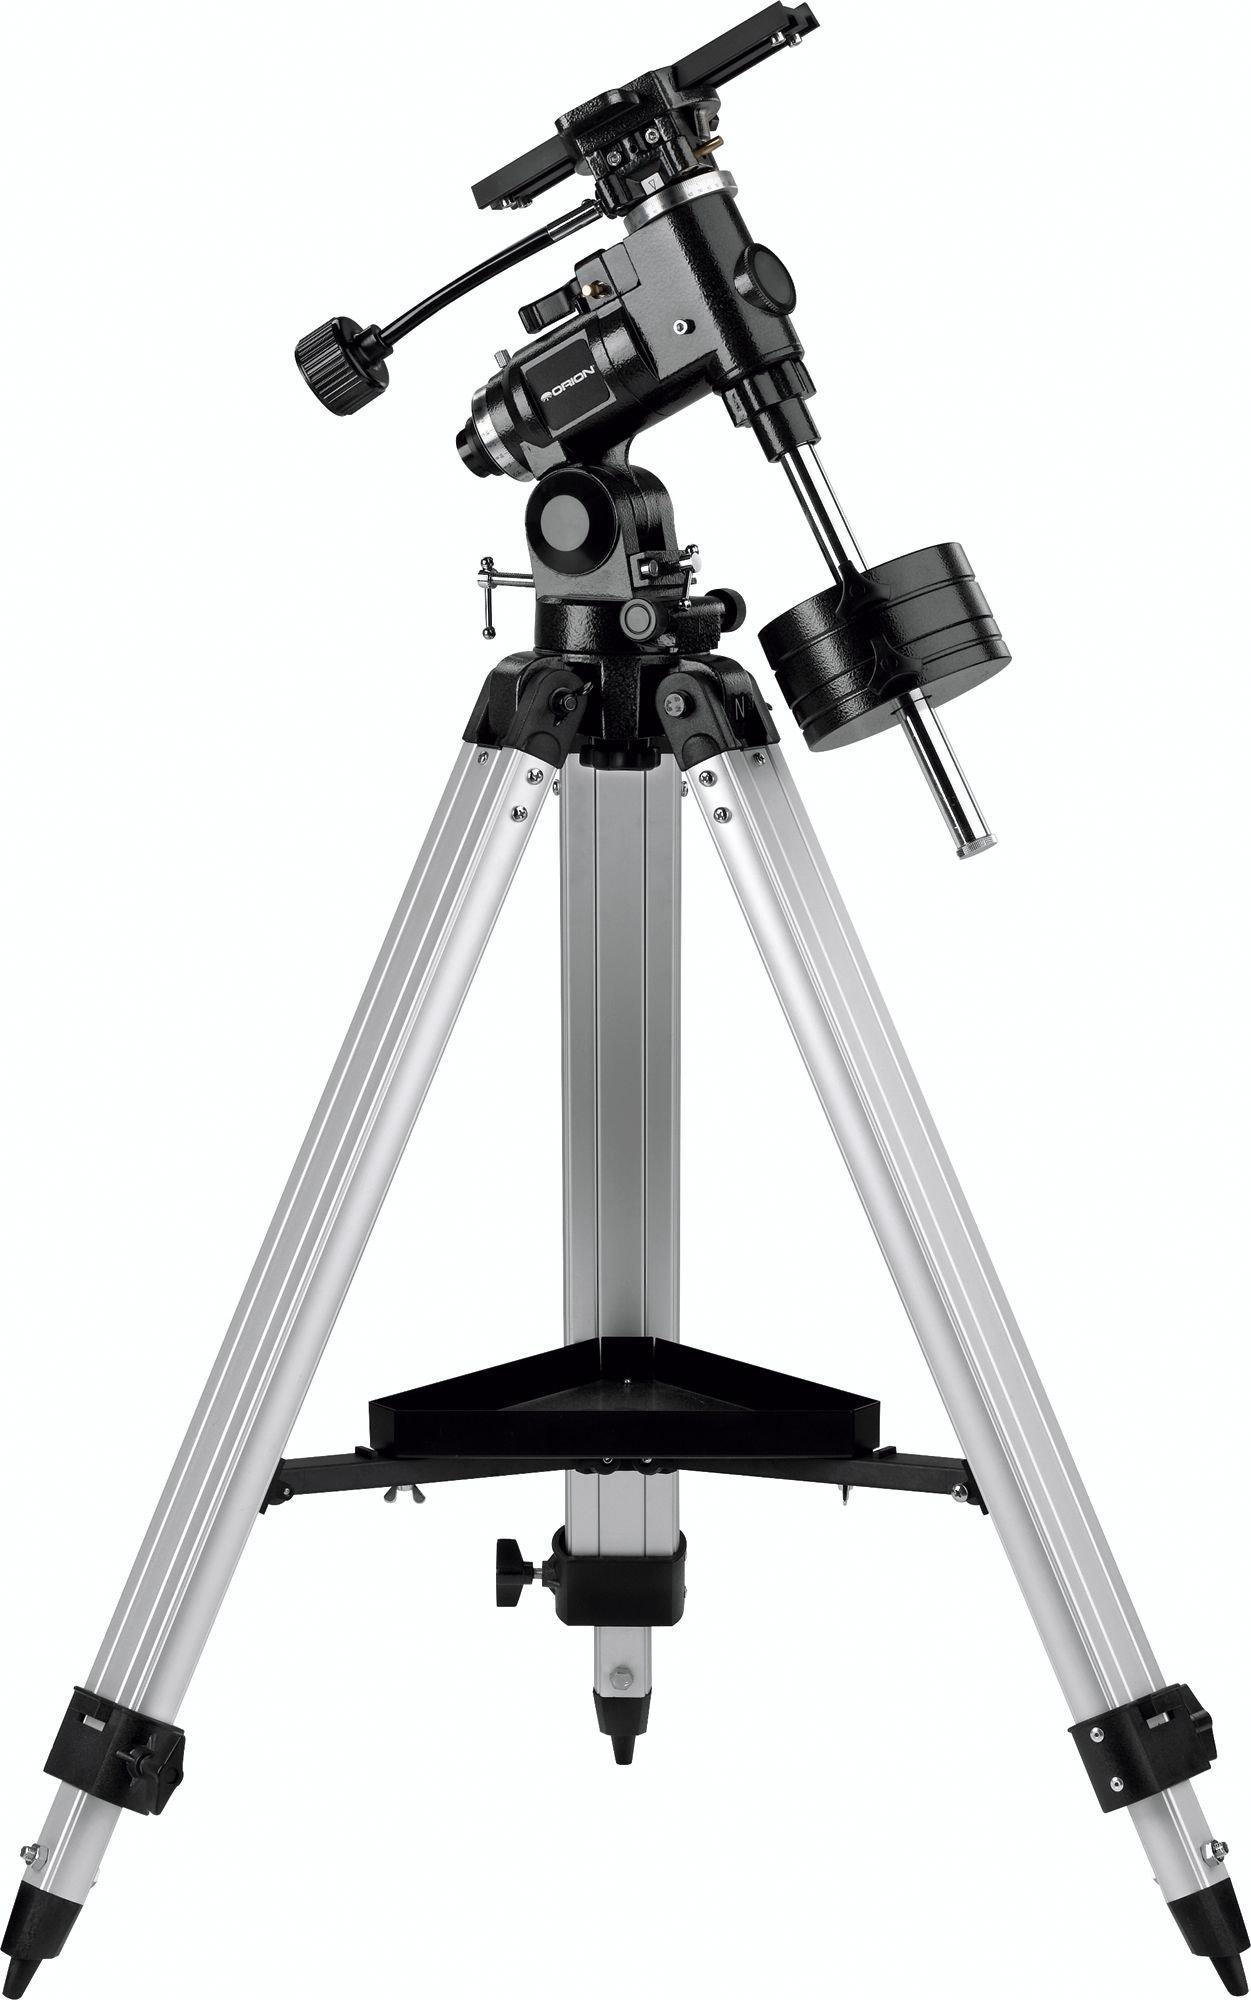 Orion 9822 AstroView Equatorial Telescope